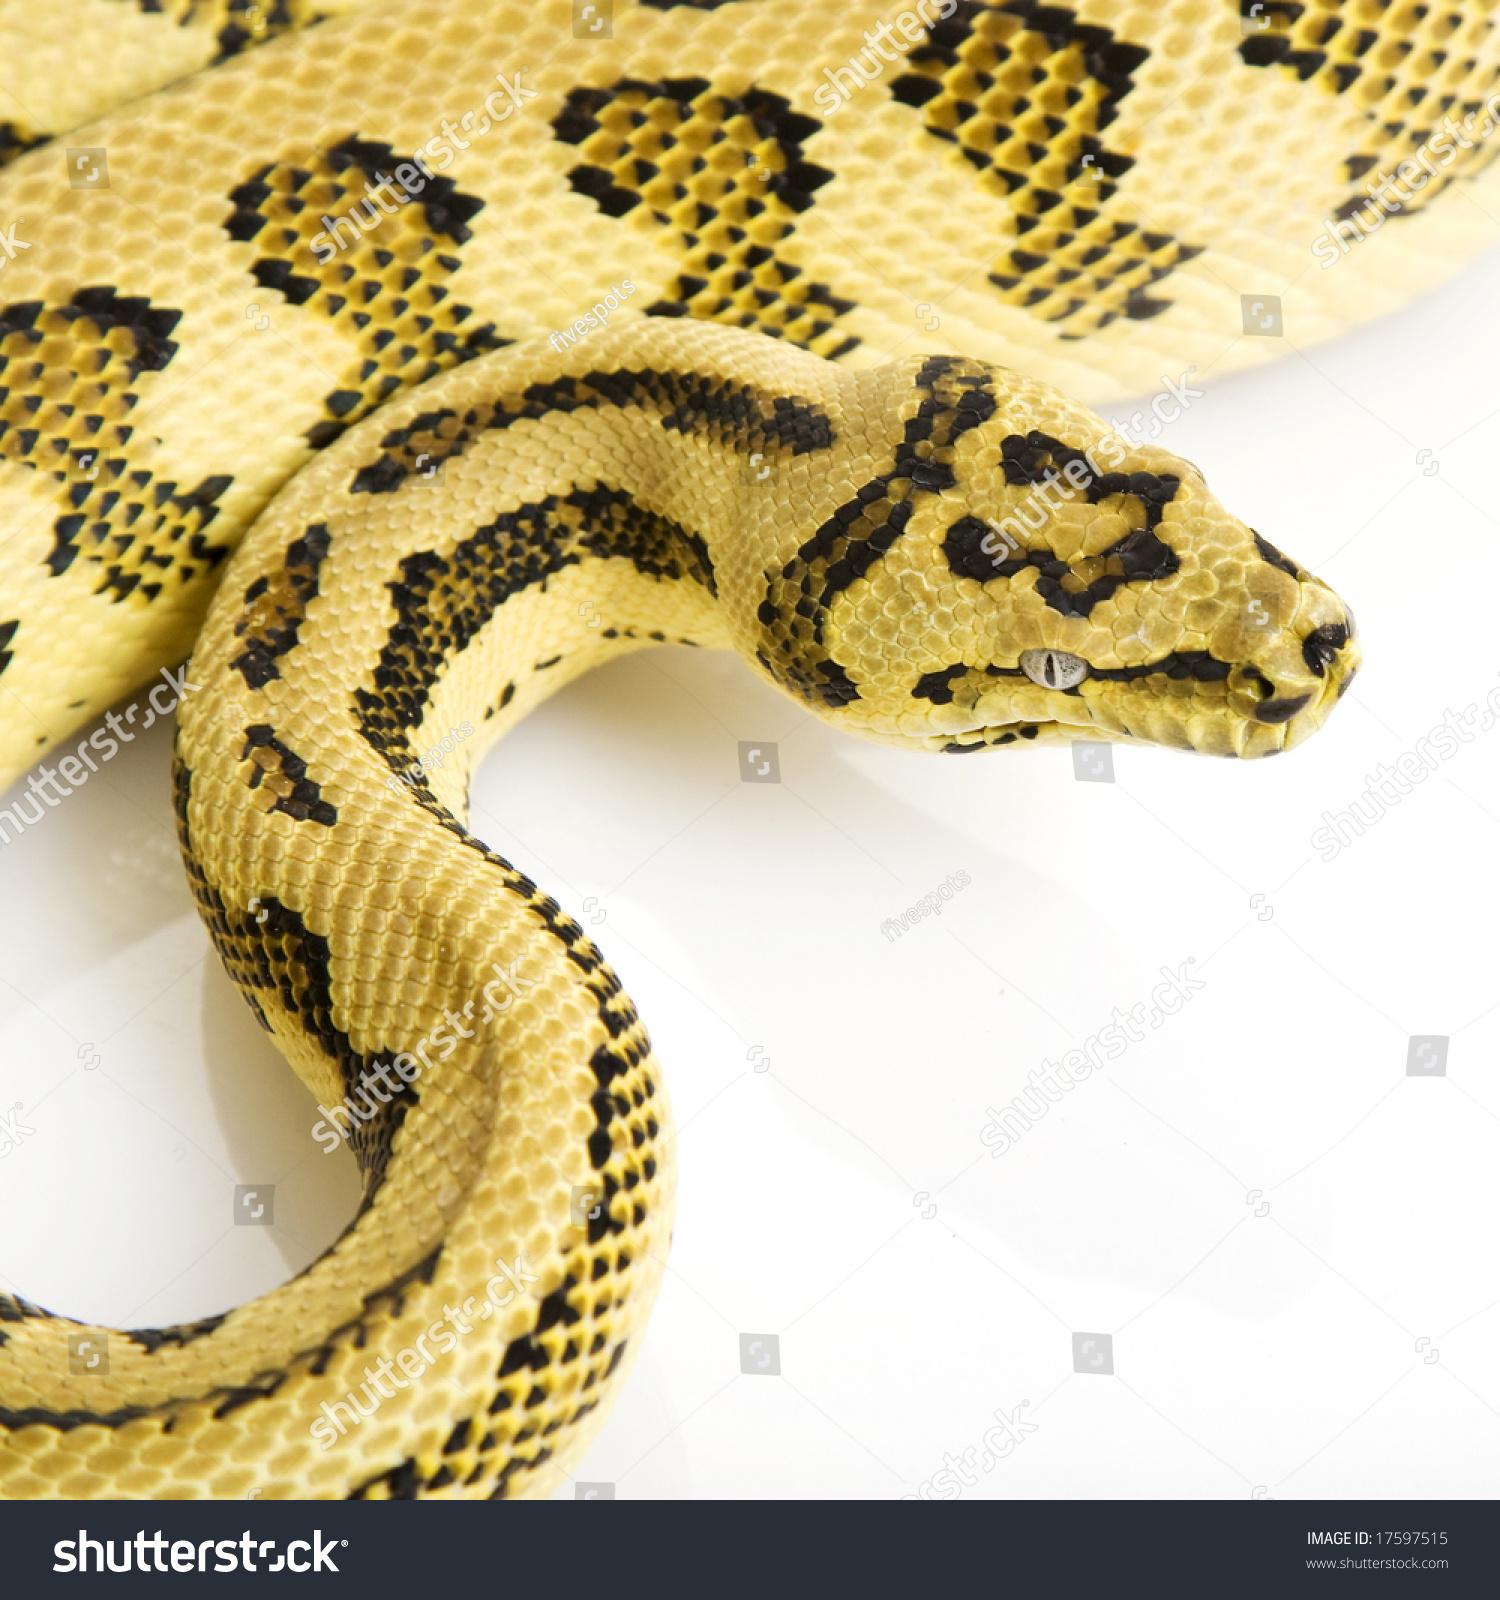 Jungle Jaguar Carpet Python (Morelia spilota variegata) on white background.